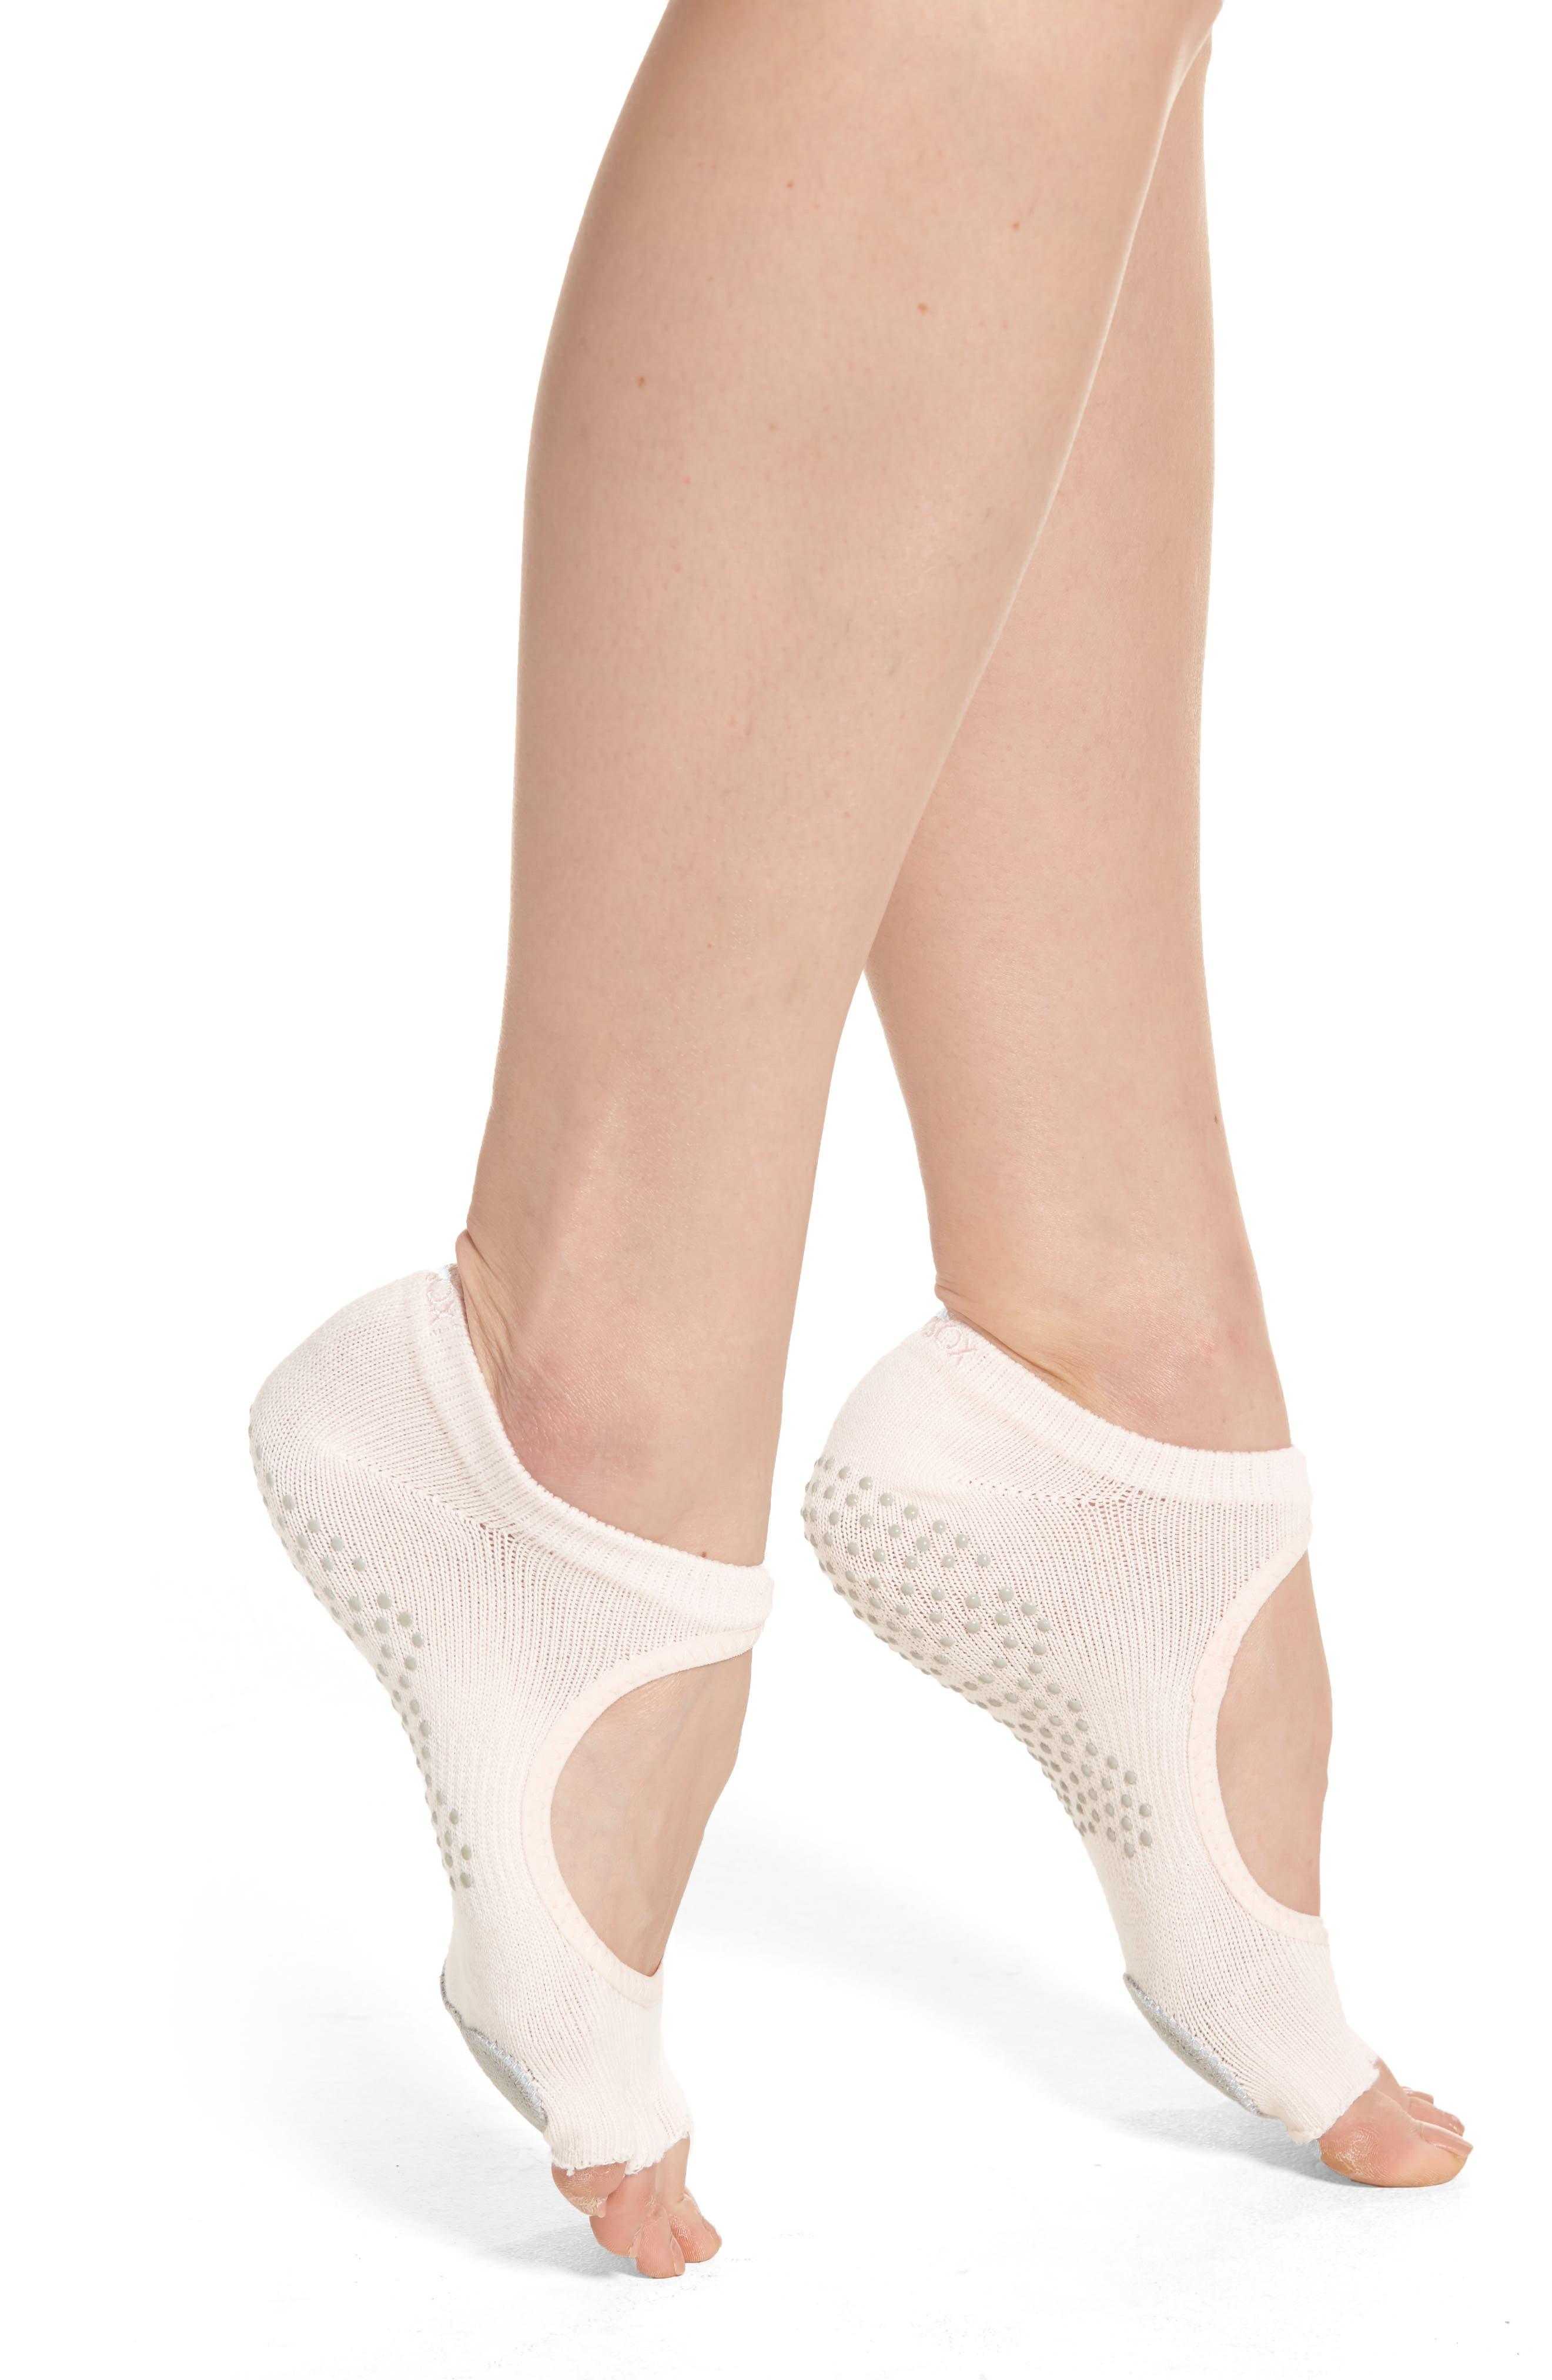 Main Image - ToeSox 'Dance Plié' Half-Toe Gripper Socks